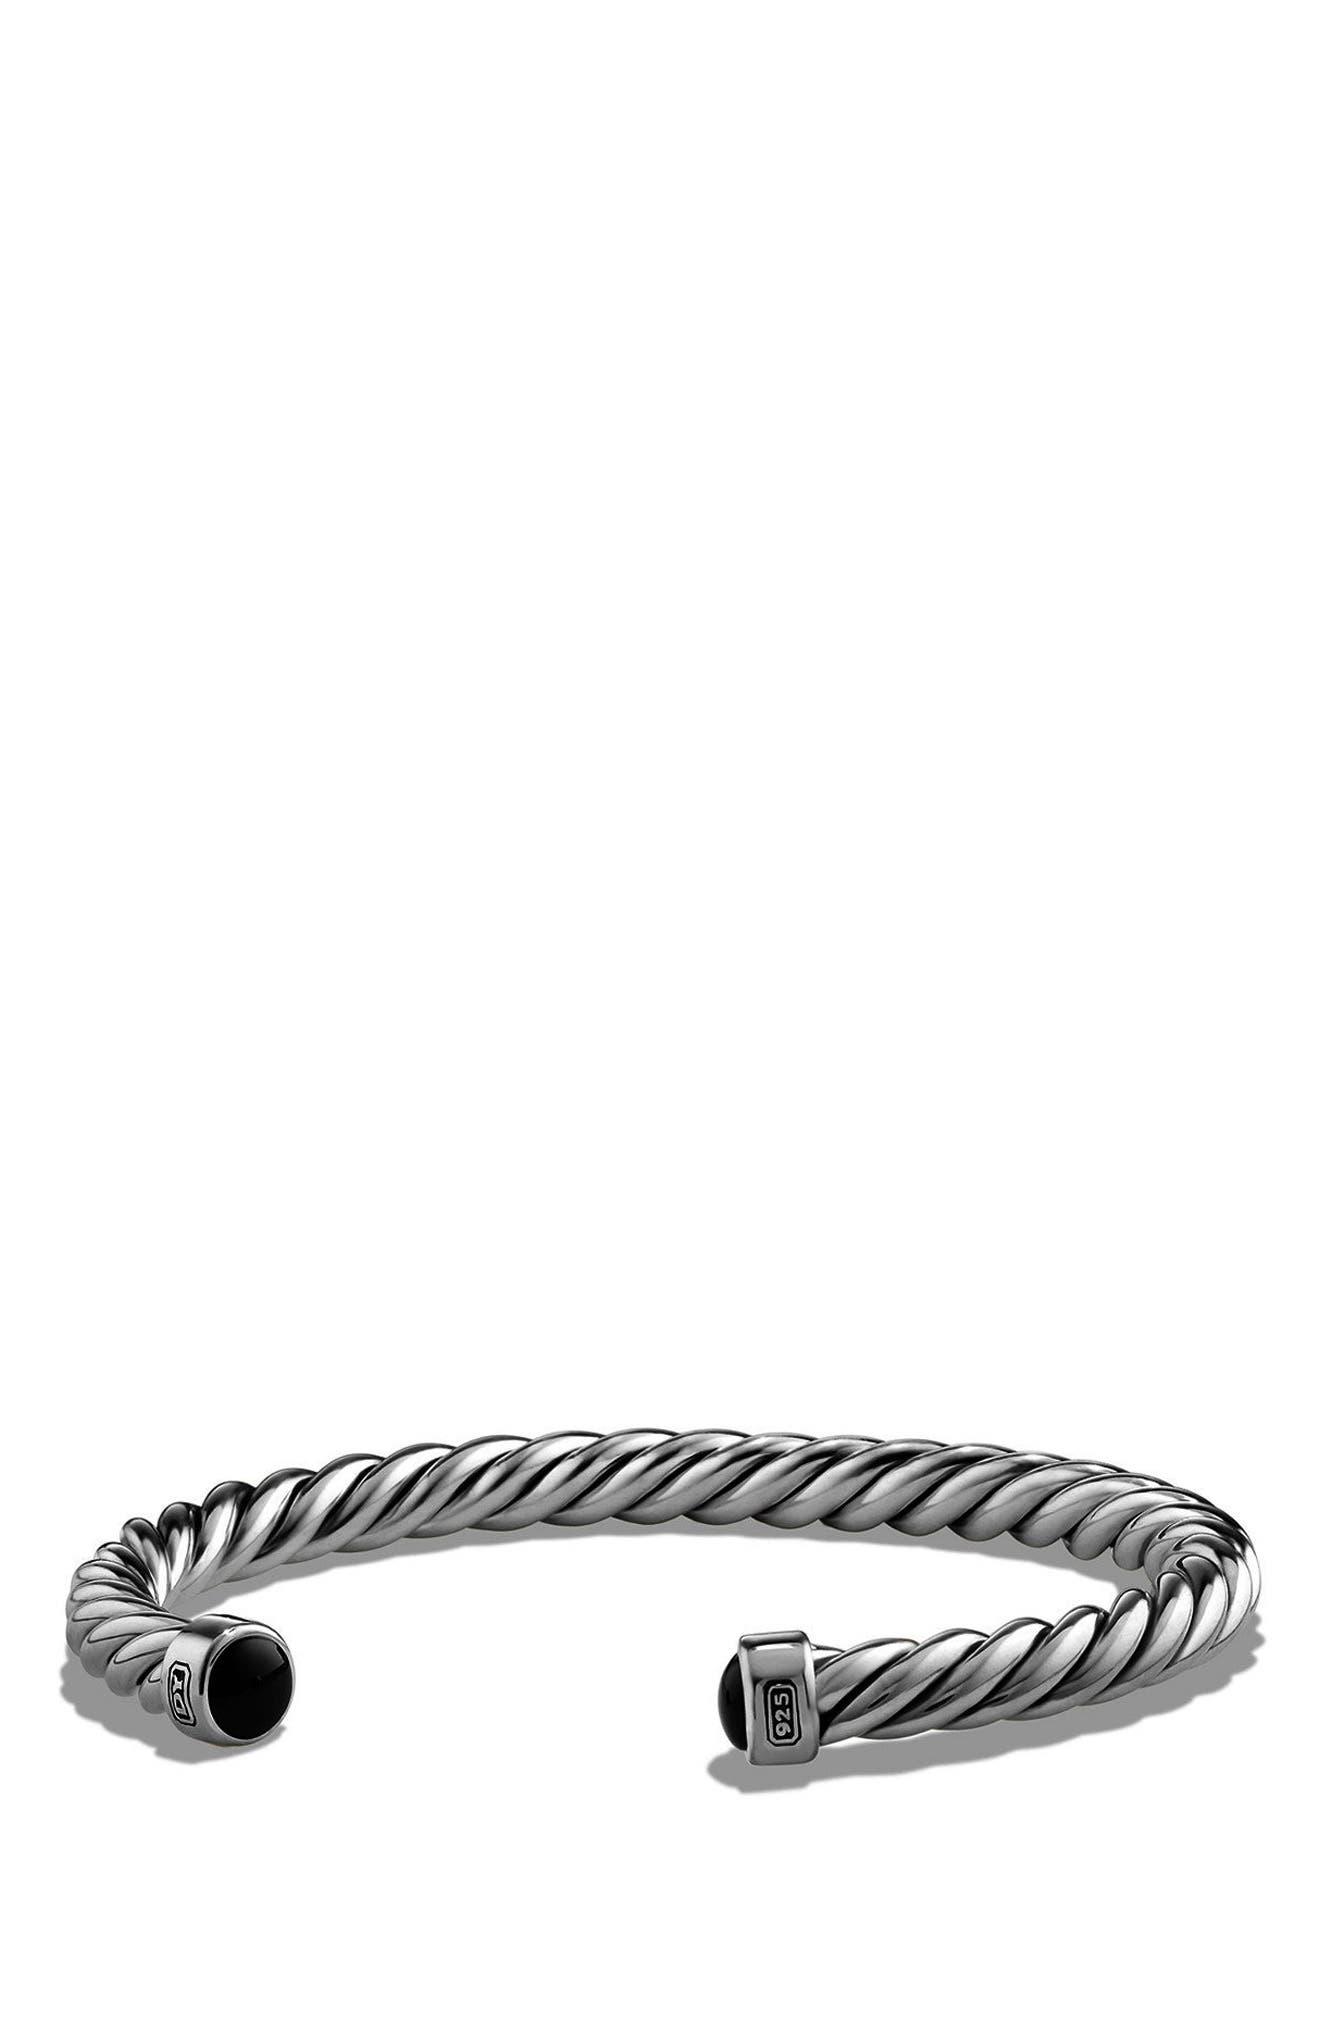 'Cable Classics' Cuff Bracelet,                             Main thumbnail 1, color,                             SILVER/ BLACK ONYX